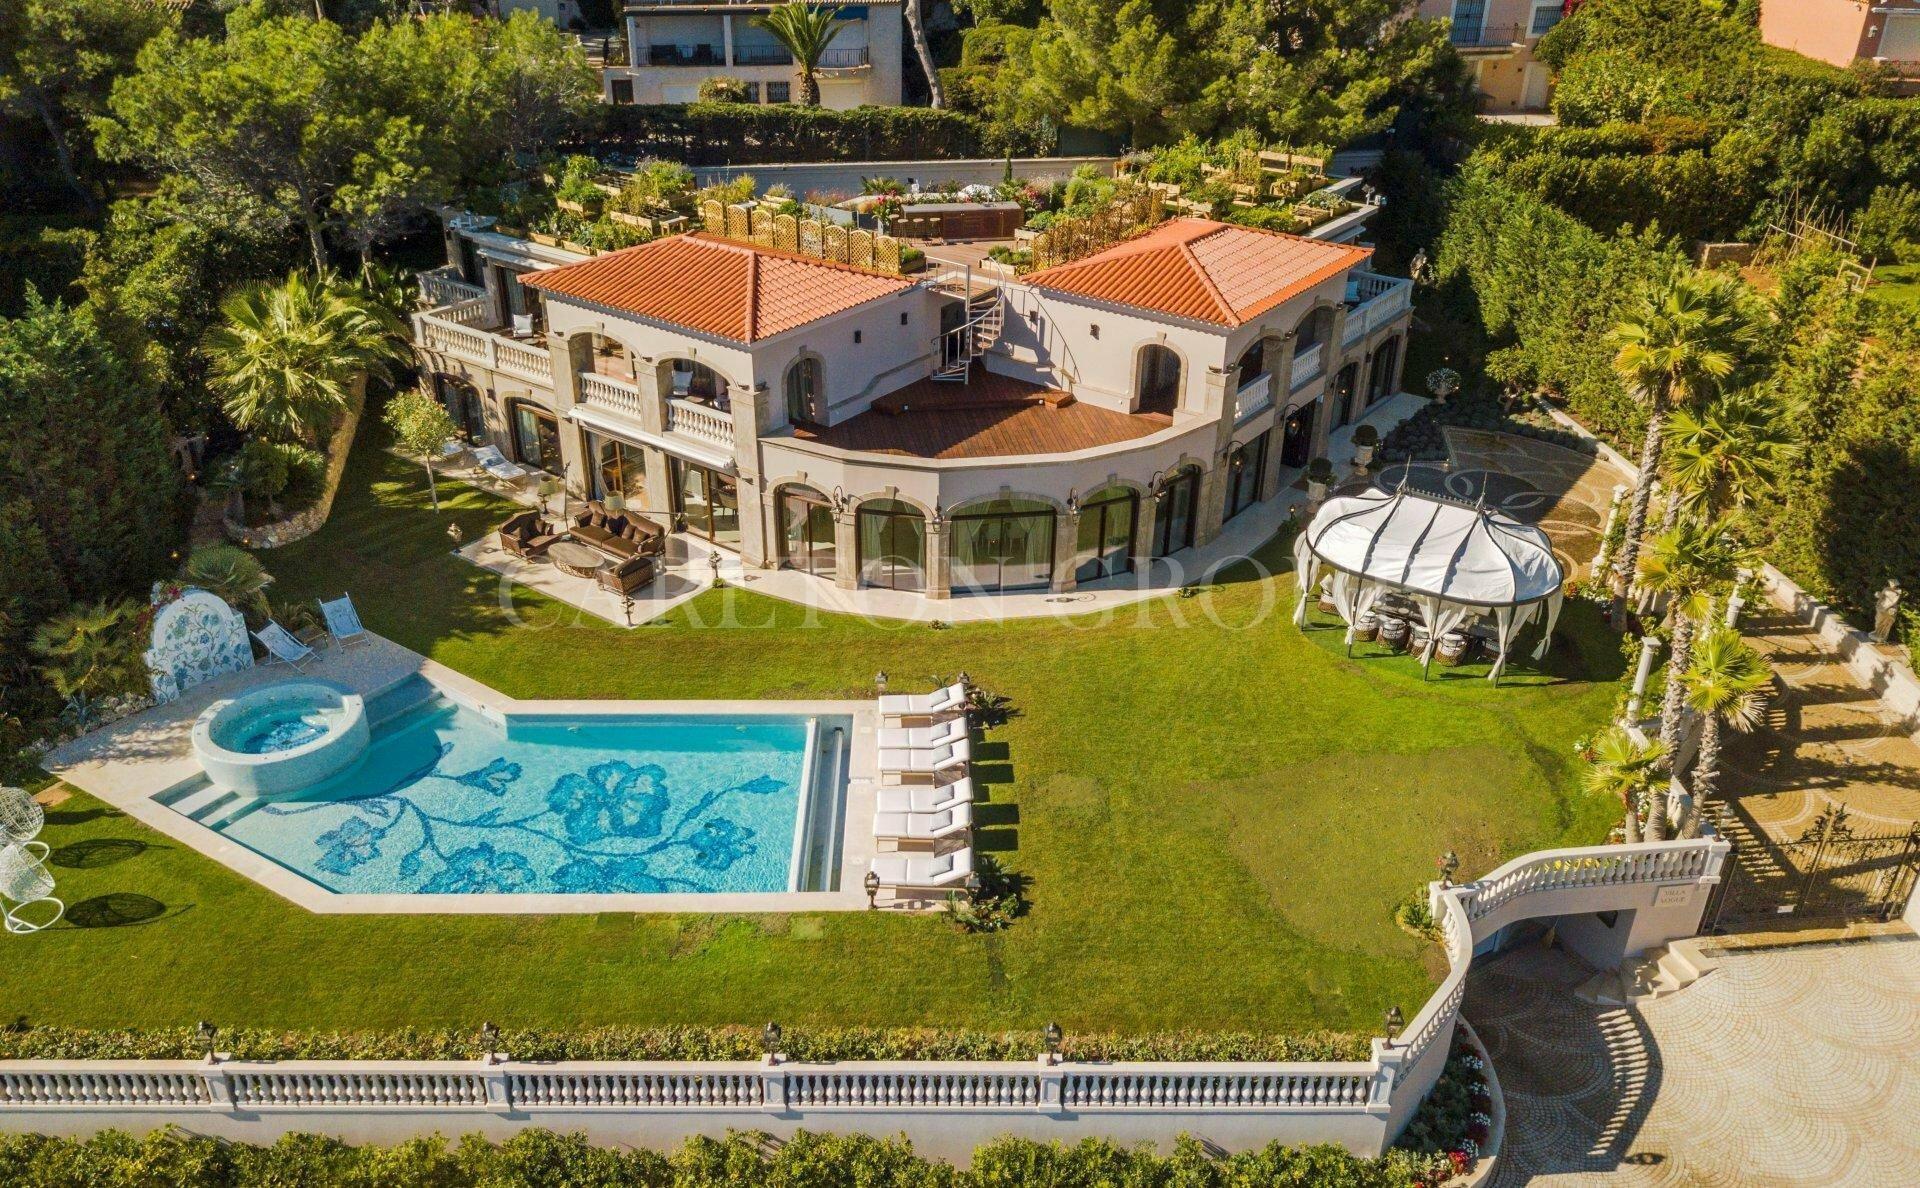 Villa in Antibes, Provence-Alpes-Côte d'Azur, France 1 - 11644692